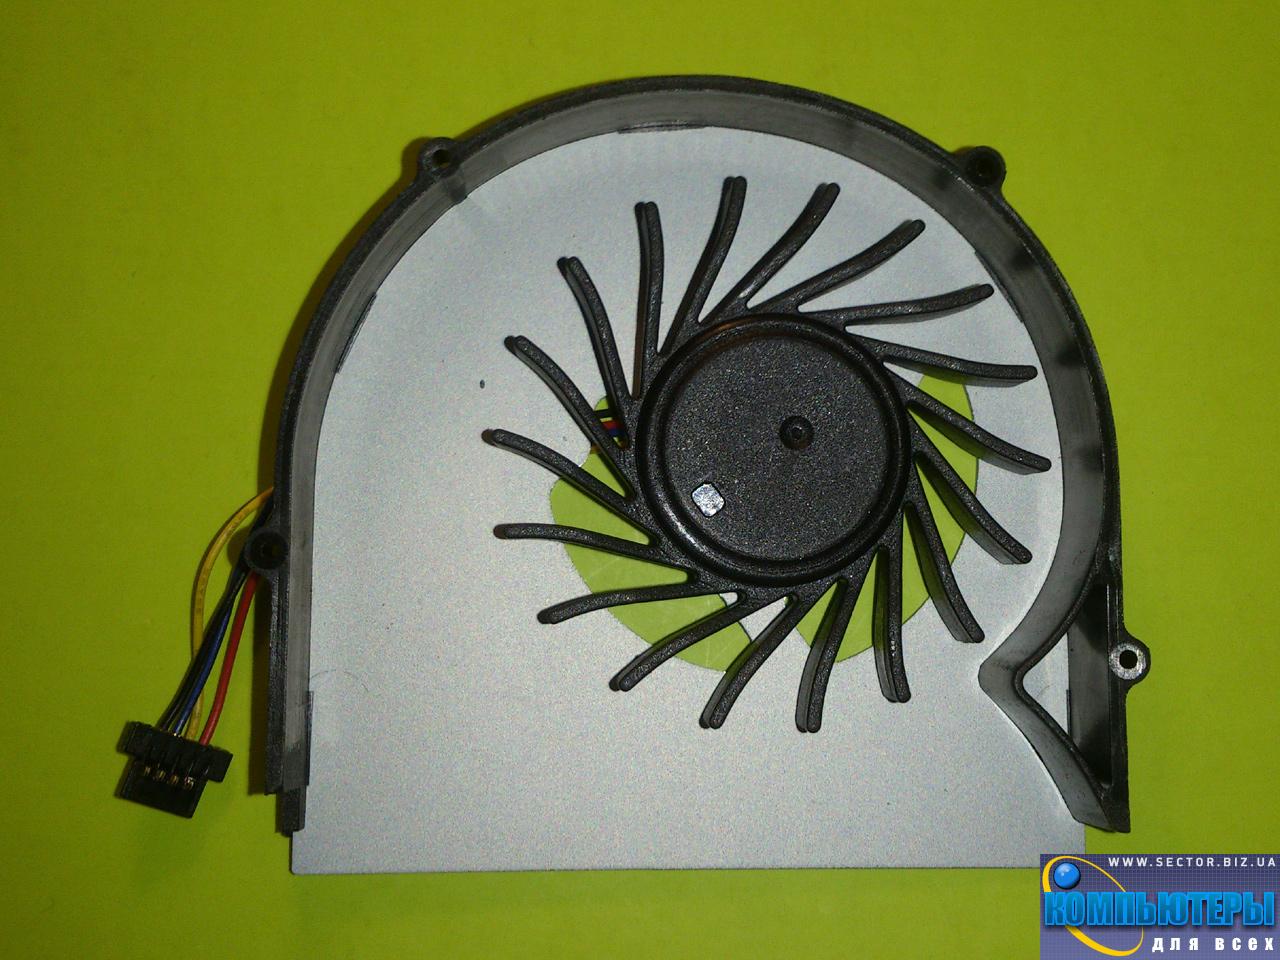 Кулер к ноутбуку Lenovo B560 B560A B560G B565 V560 V565 Z560 p/n: AB7205HX-GC1. Фото № 3.